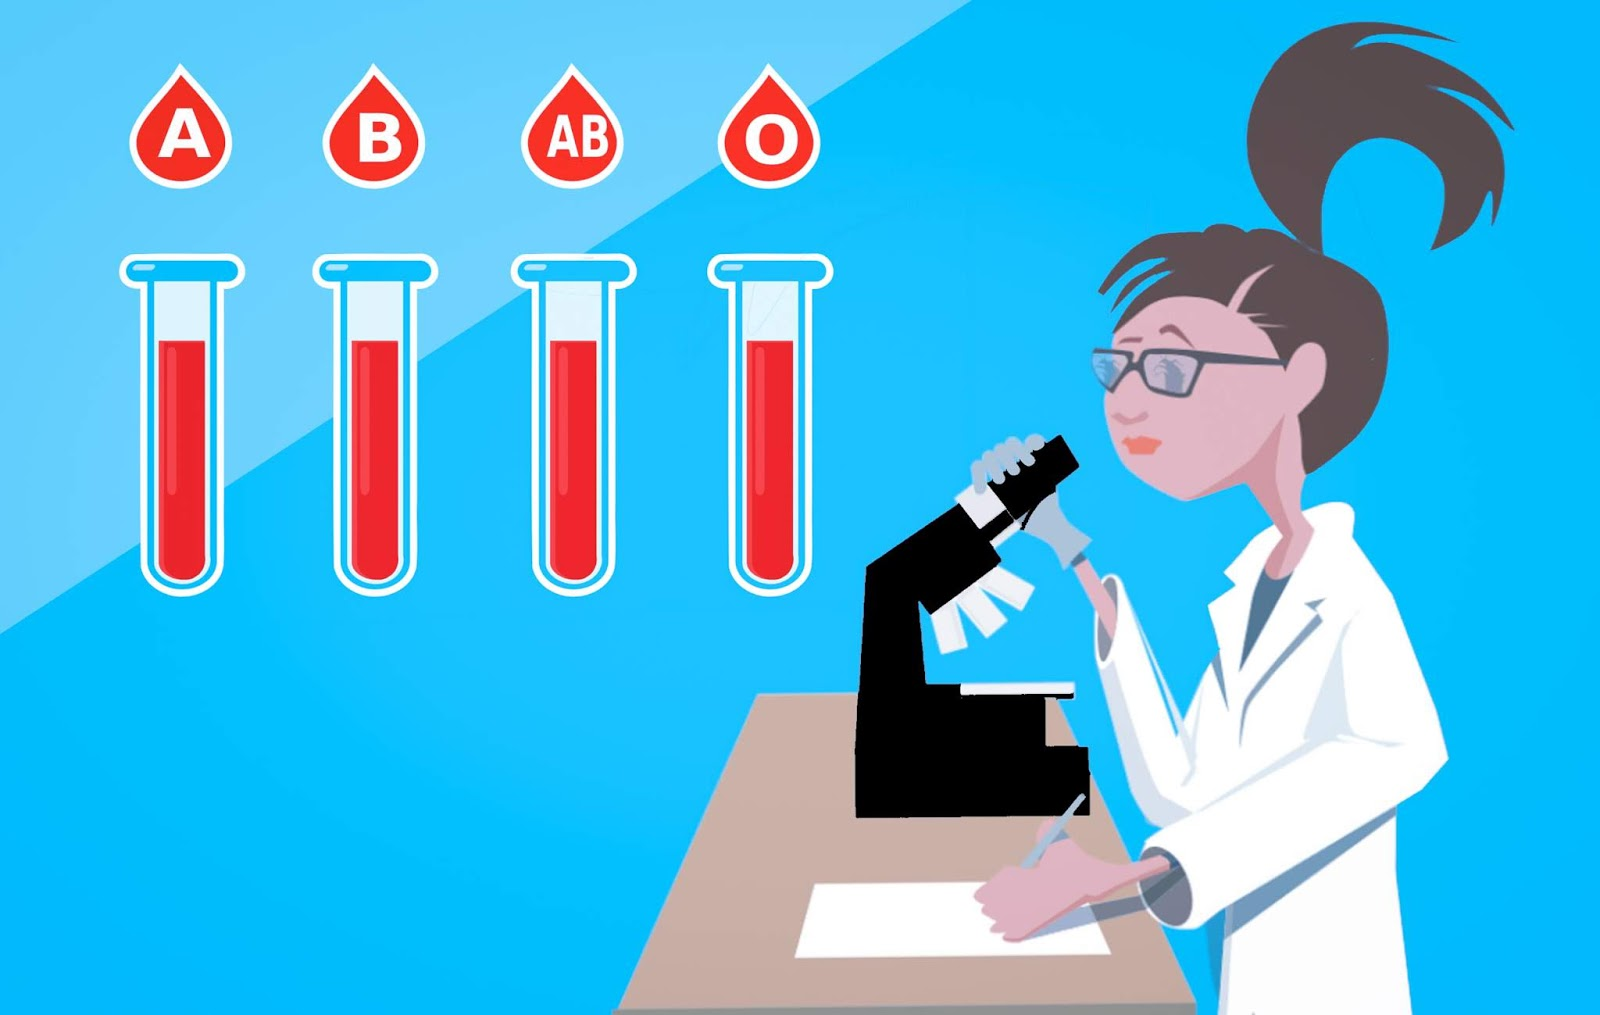 blood, hepatitis, scientist, diabetes, examination, doctor, lab, biology, sugar, investigation, blood group, blood typing, blood values, research, drug test, medical, plasma, sampling, test, microscope